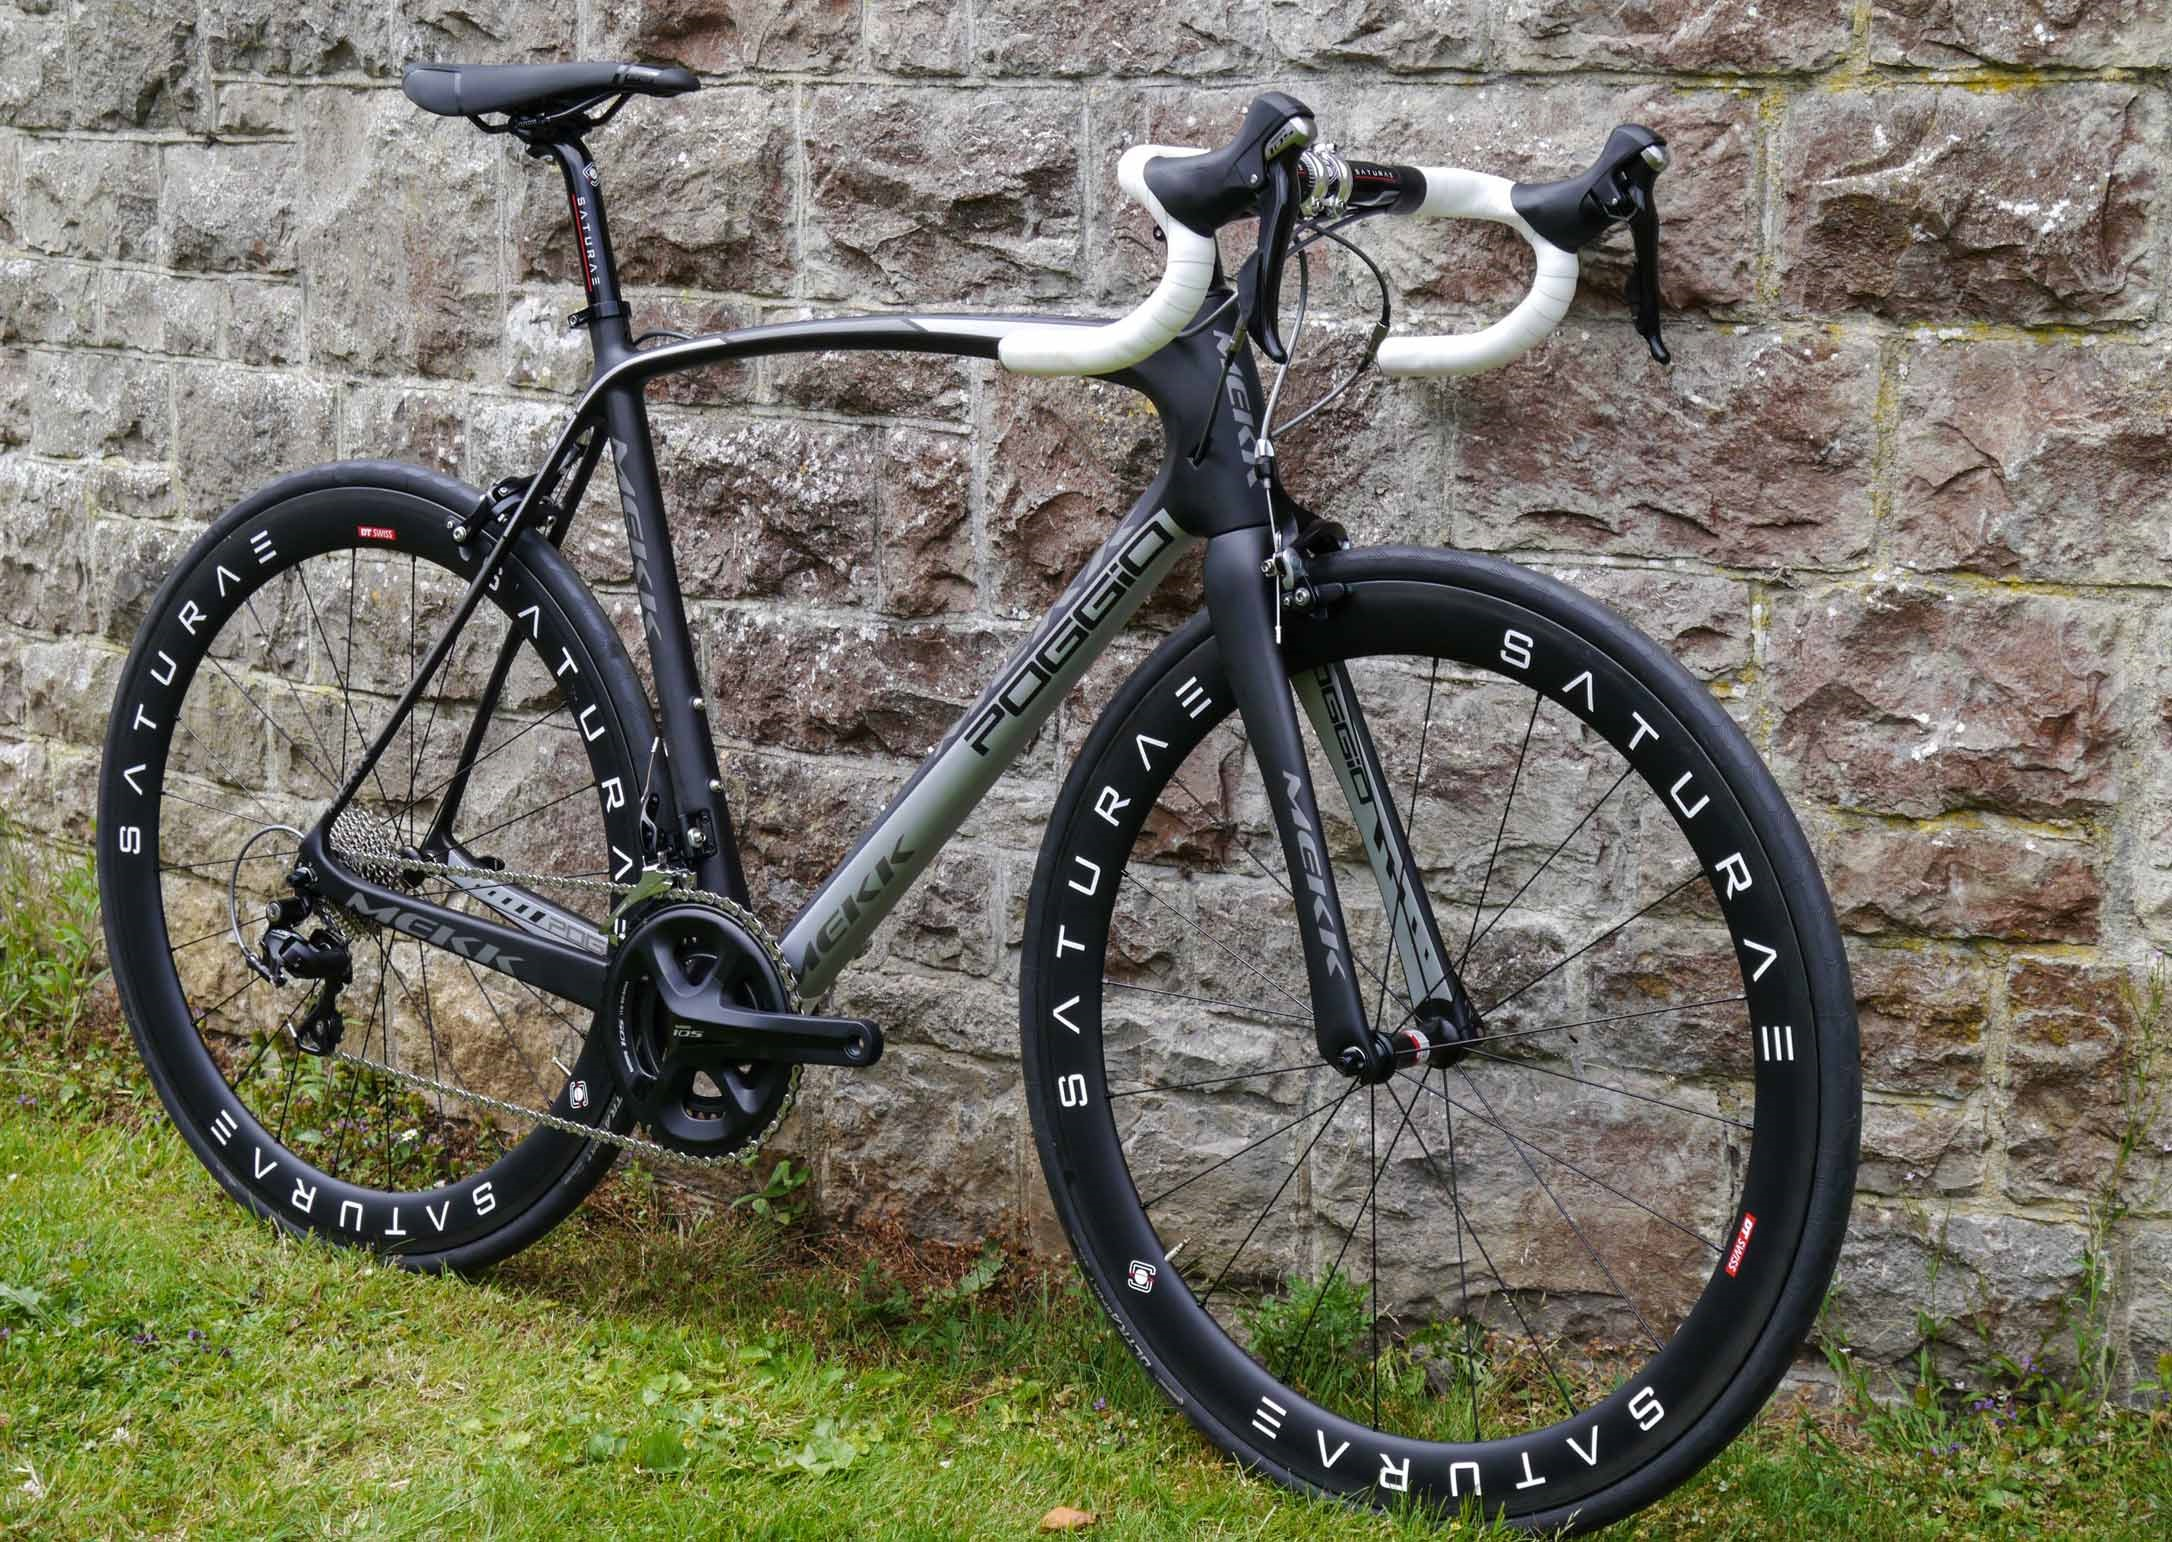 Mekk-bikes-poggio-road-bike-aero-bike-carbon-1